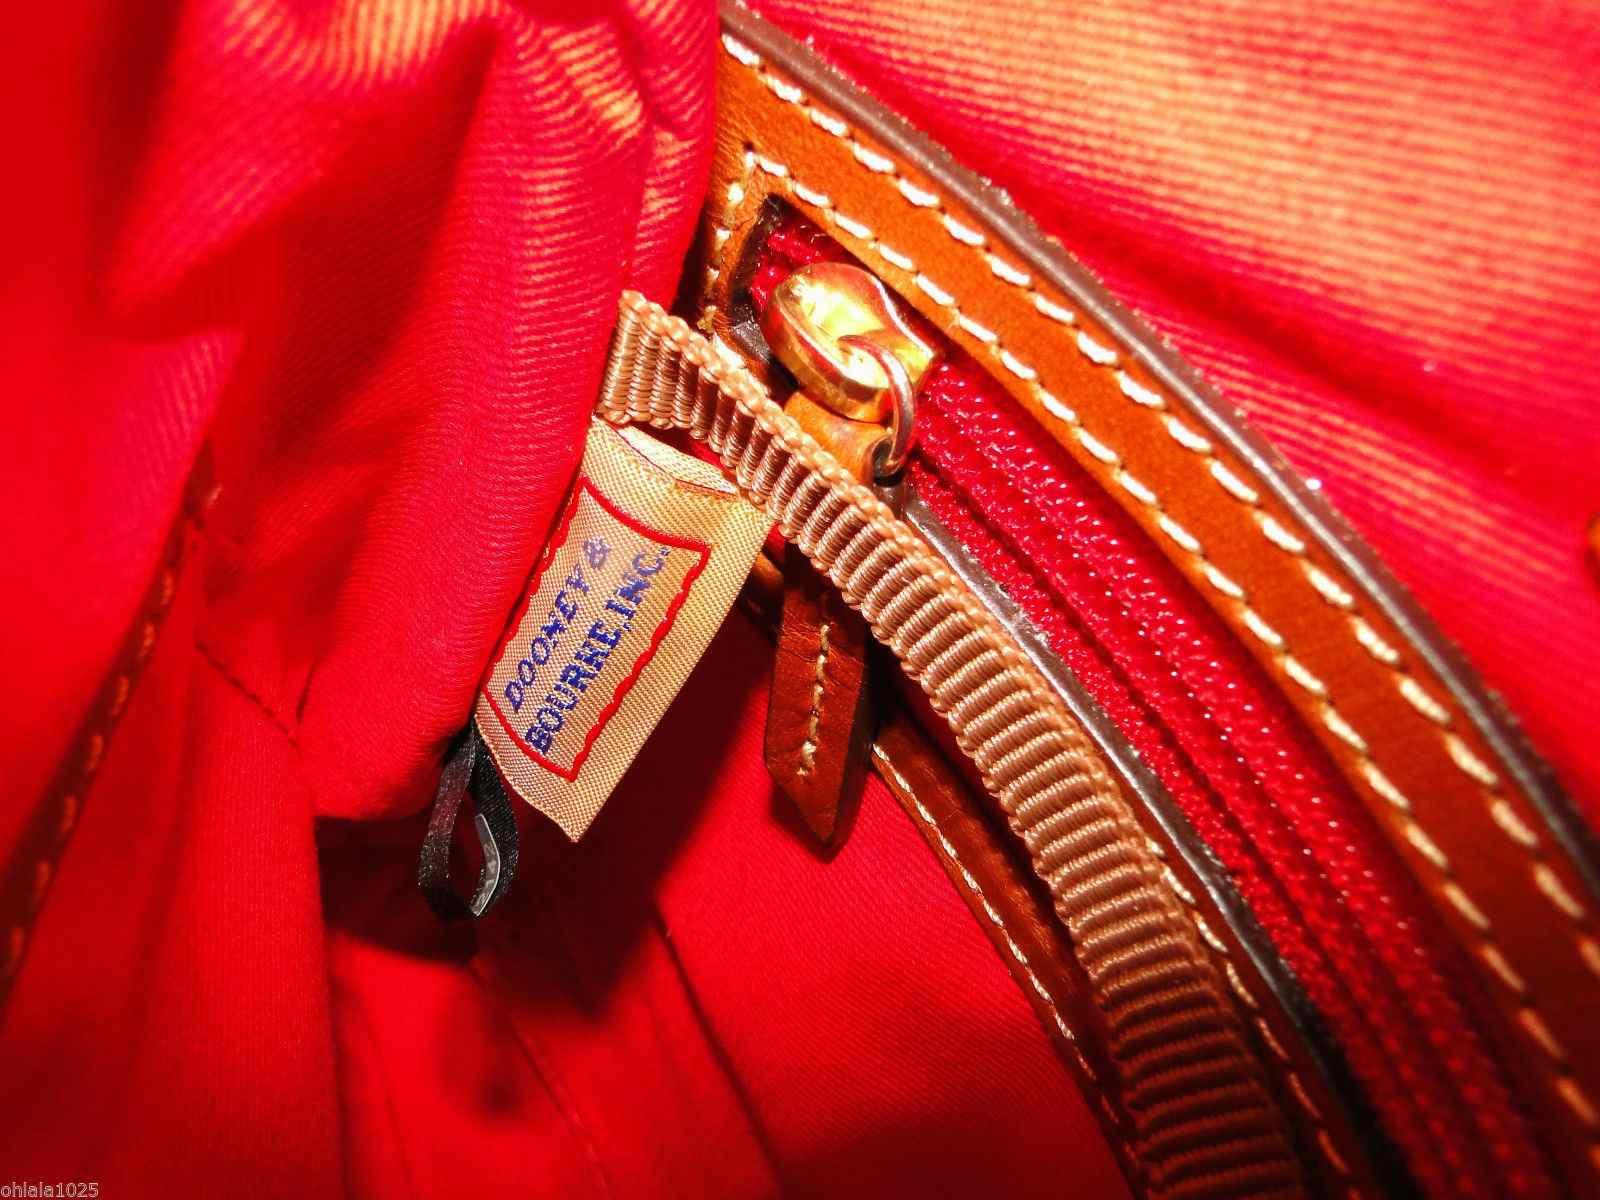 Dooney & Bourke Pebble Leather Crossbody Spring Fuchsia